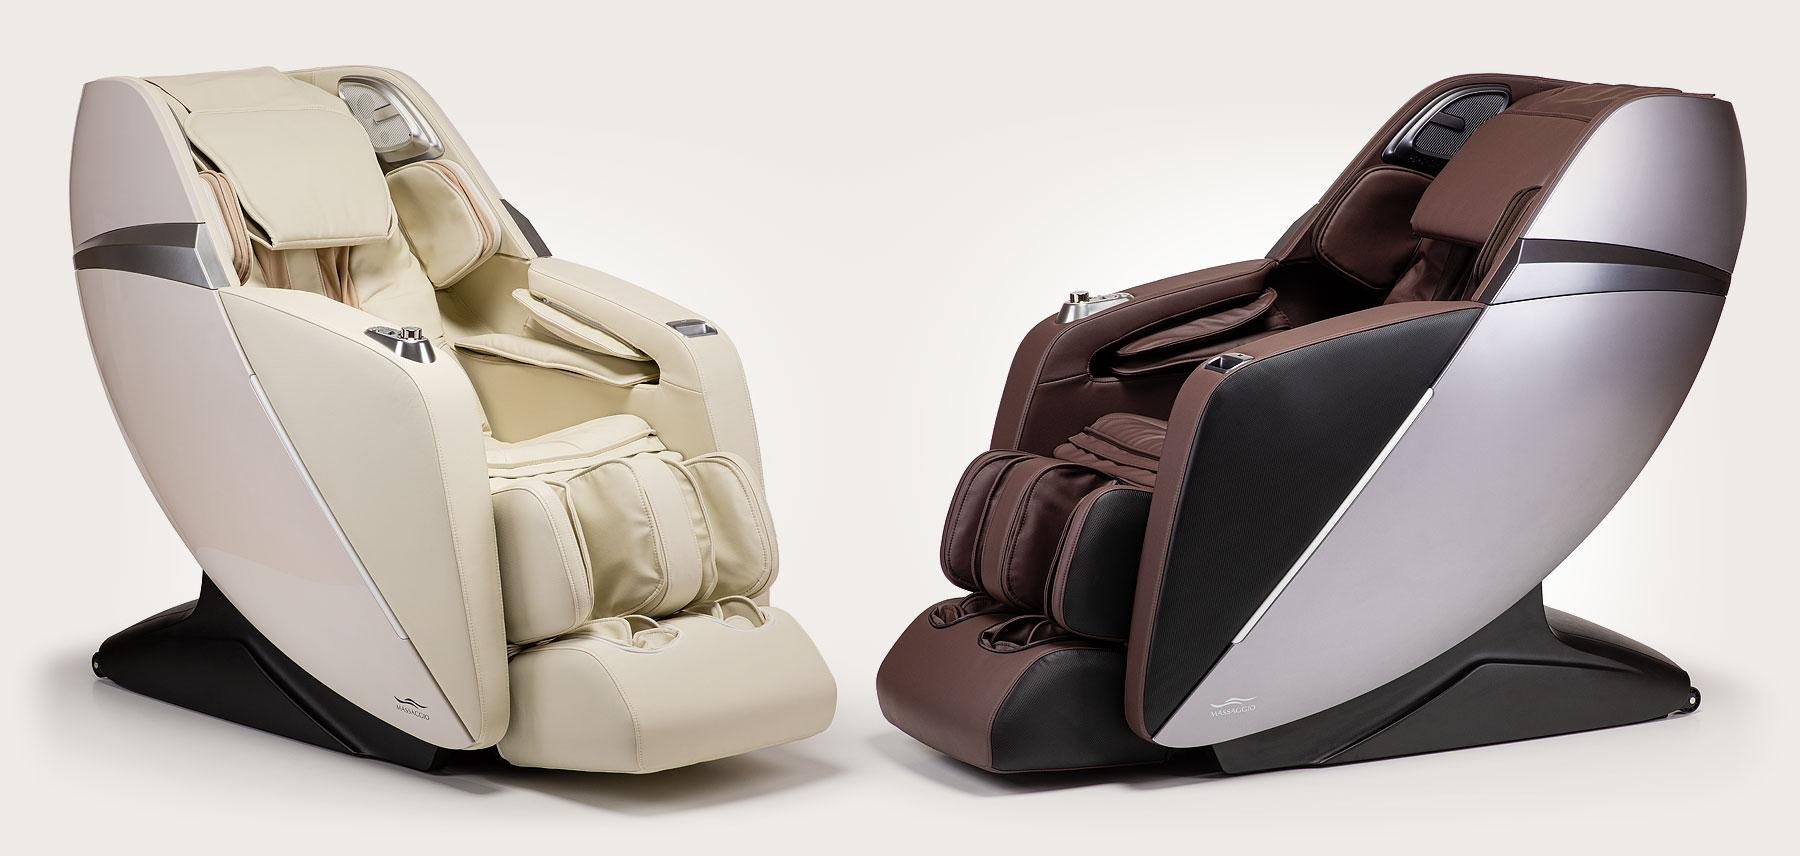 Fotel masujący Massaggio Esclusivo 2 - kolory